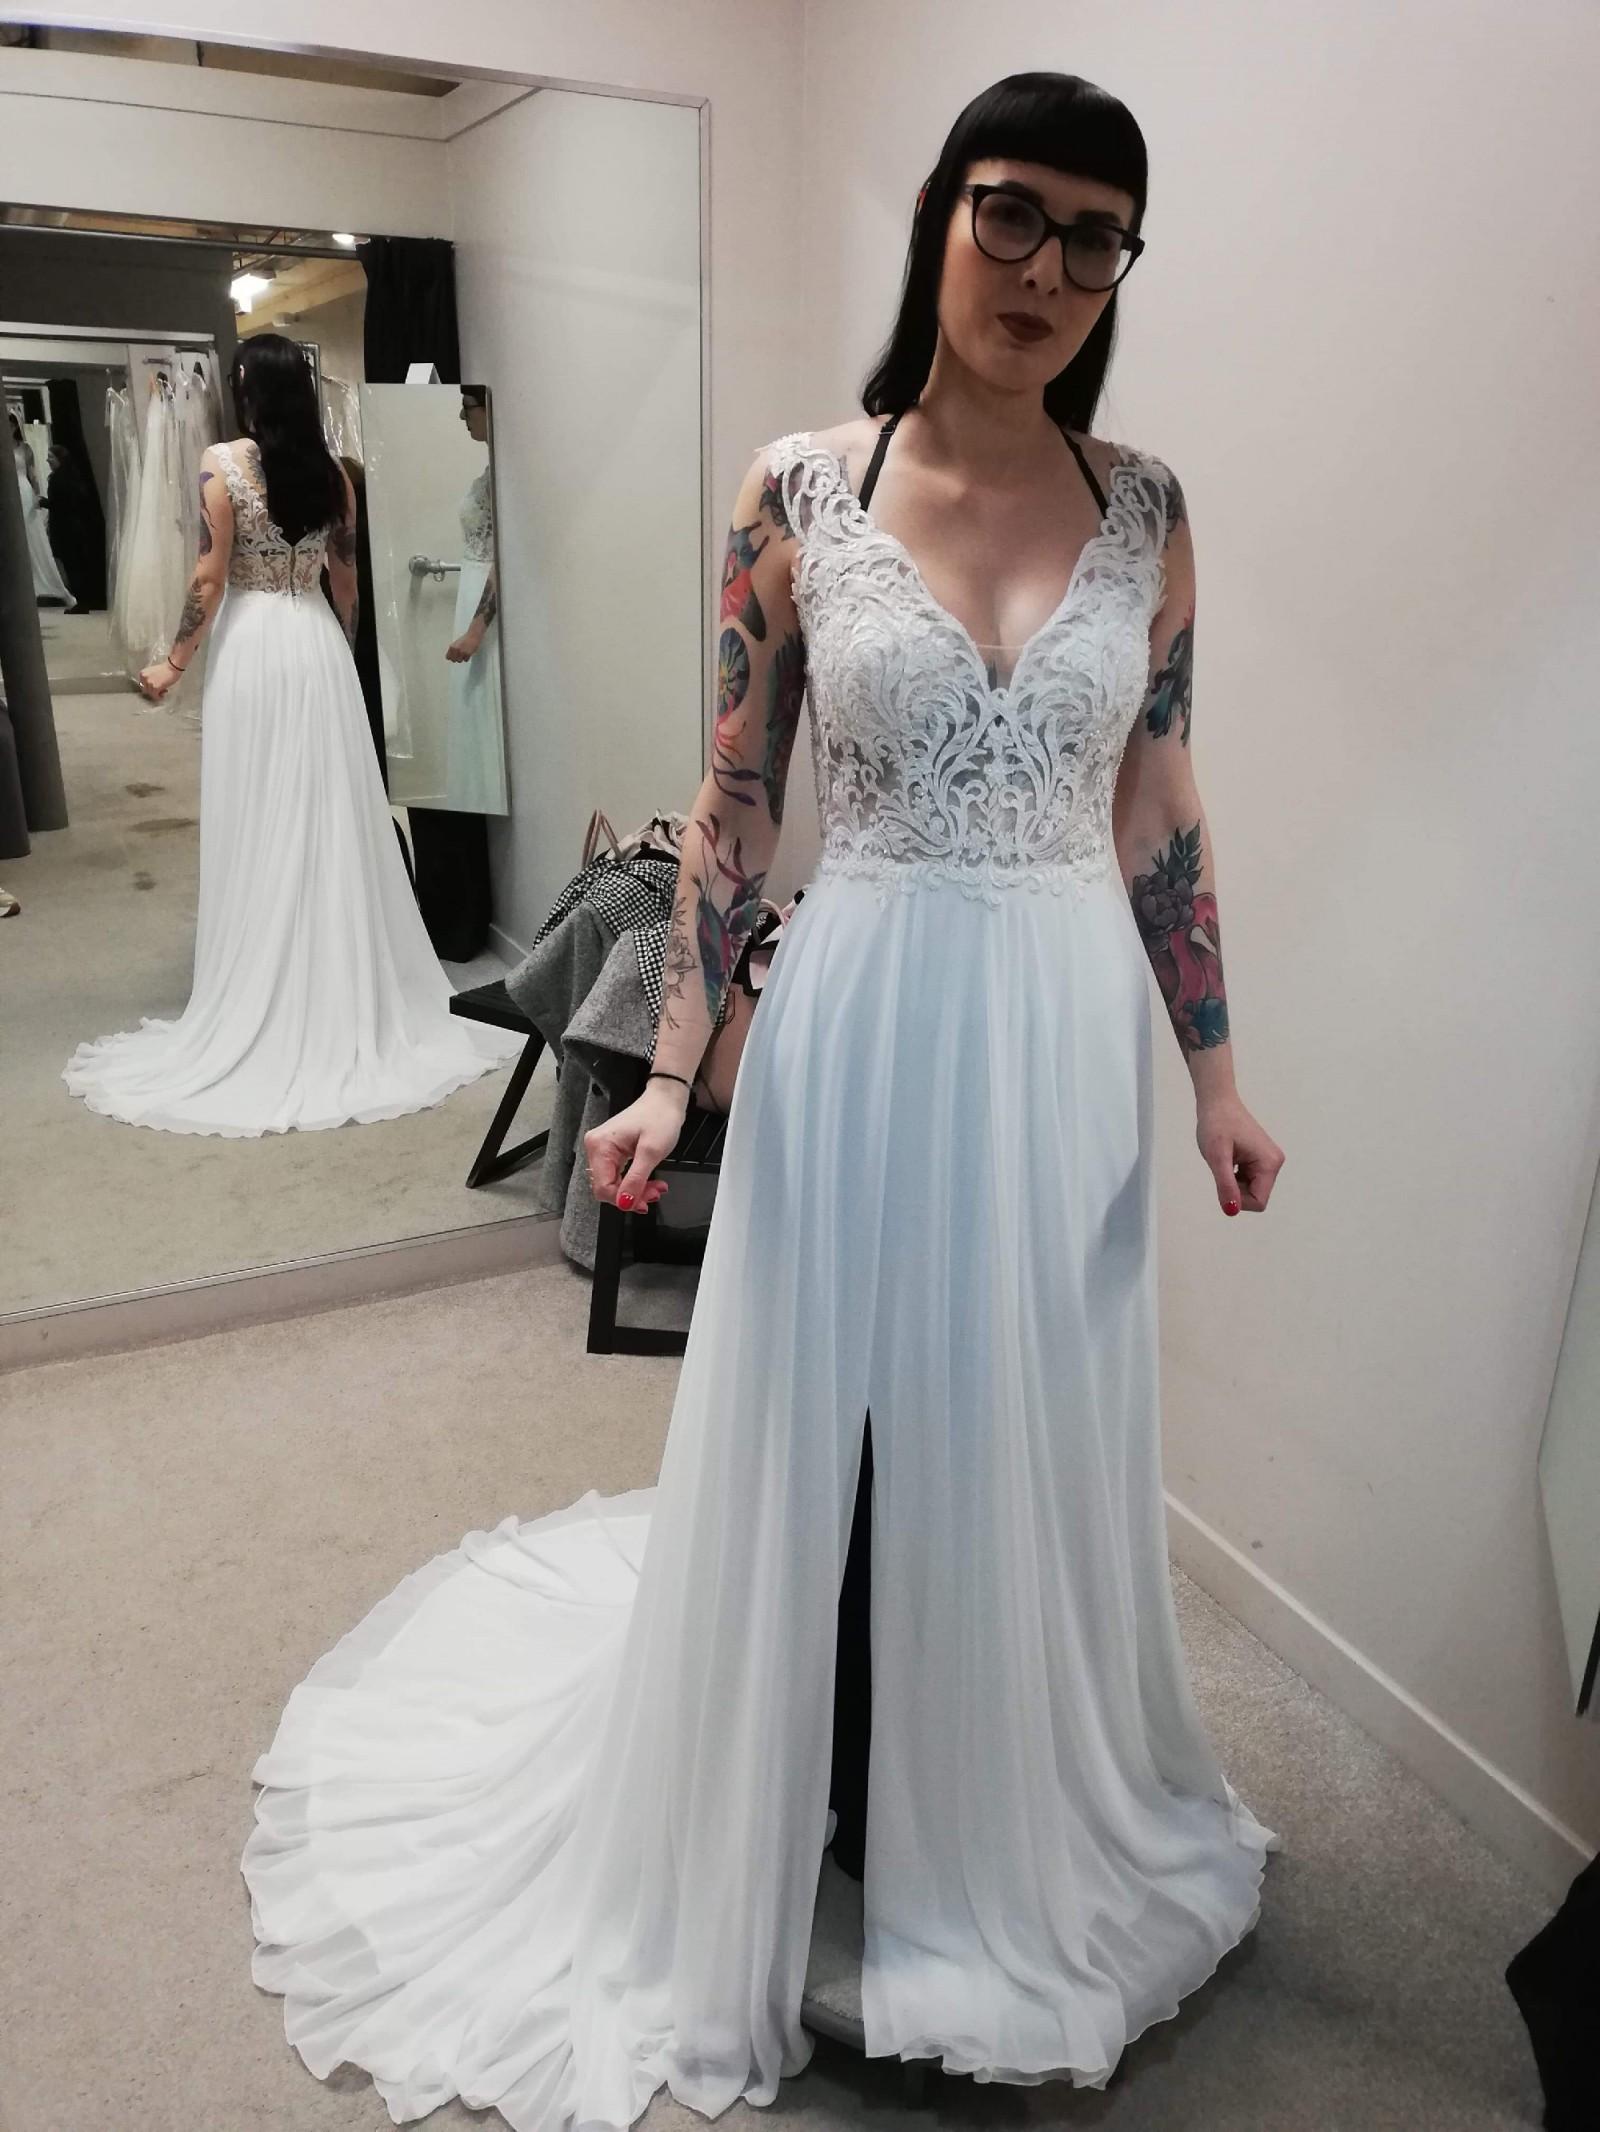 size 20 wedding dress off 20   medpharmres.com